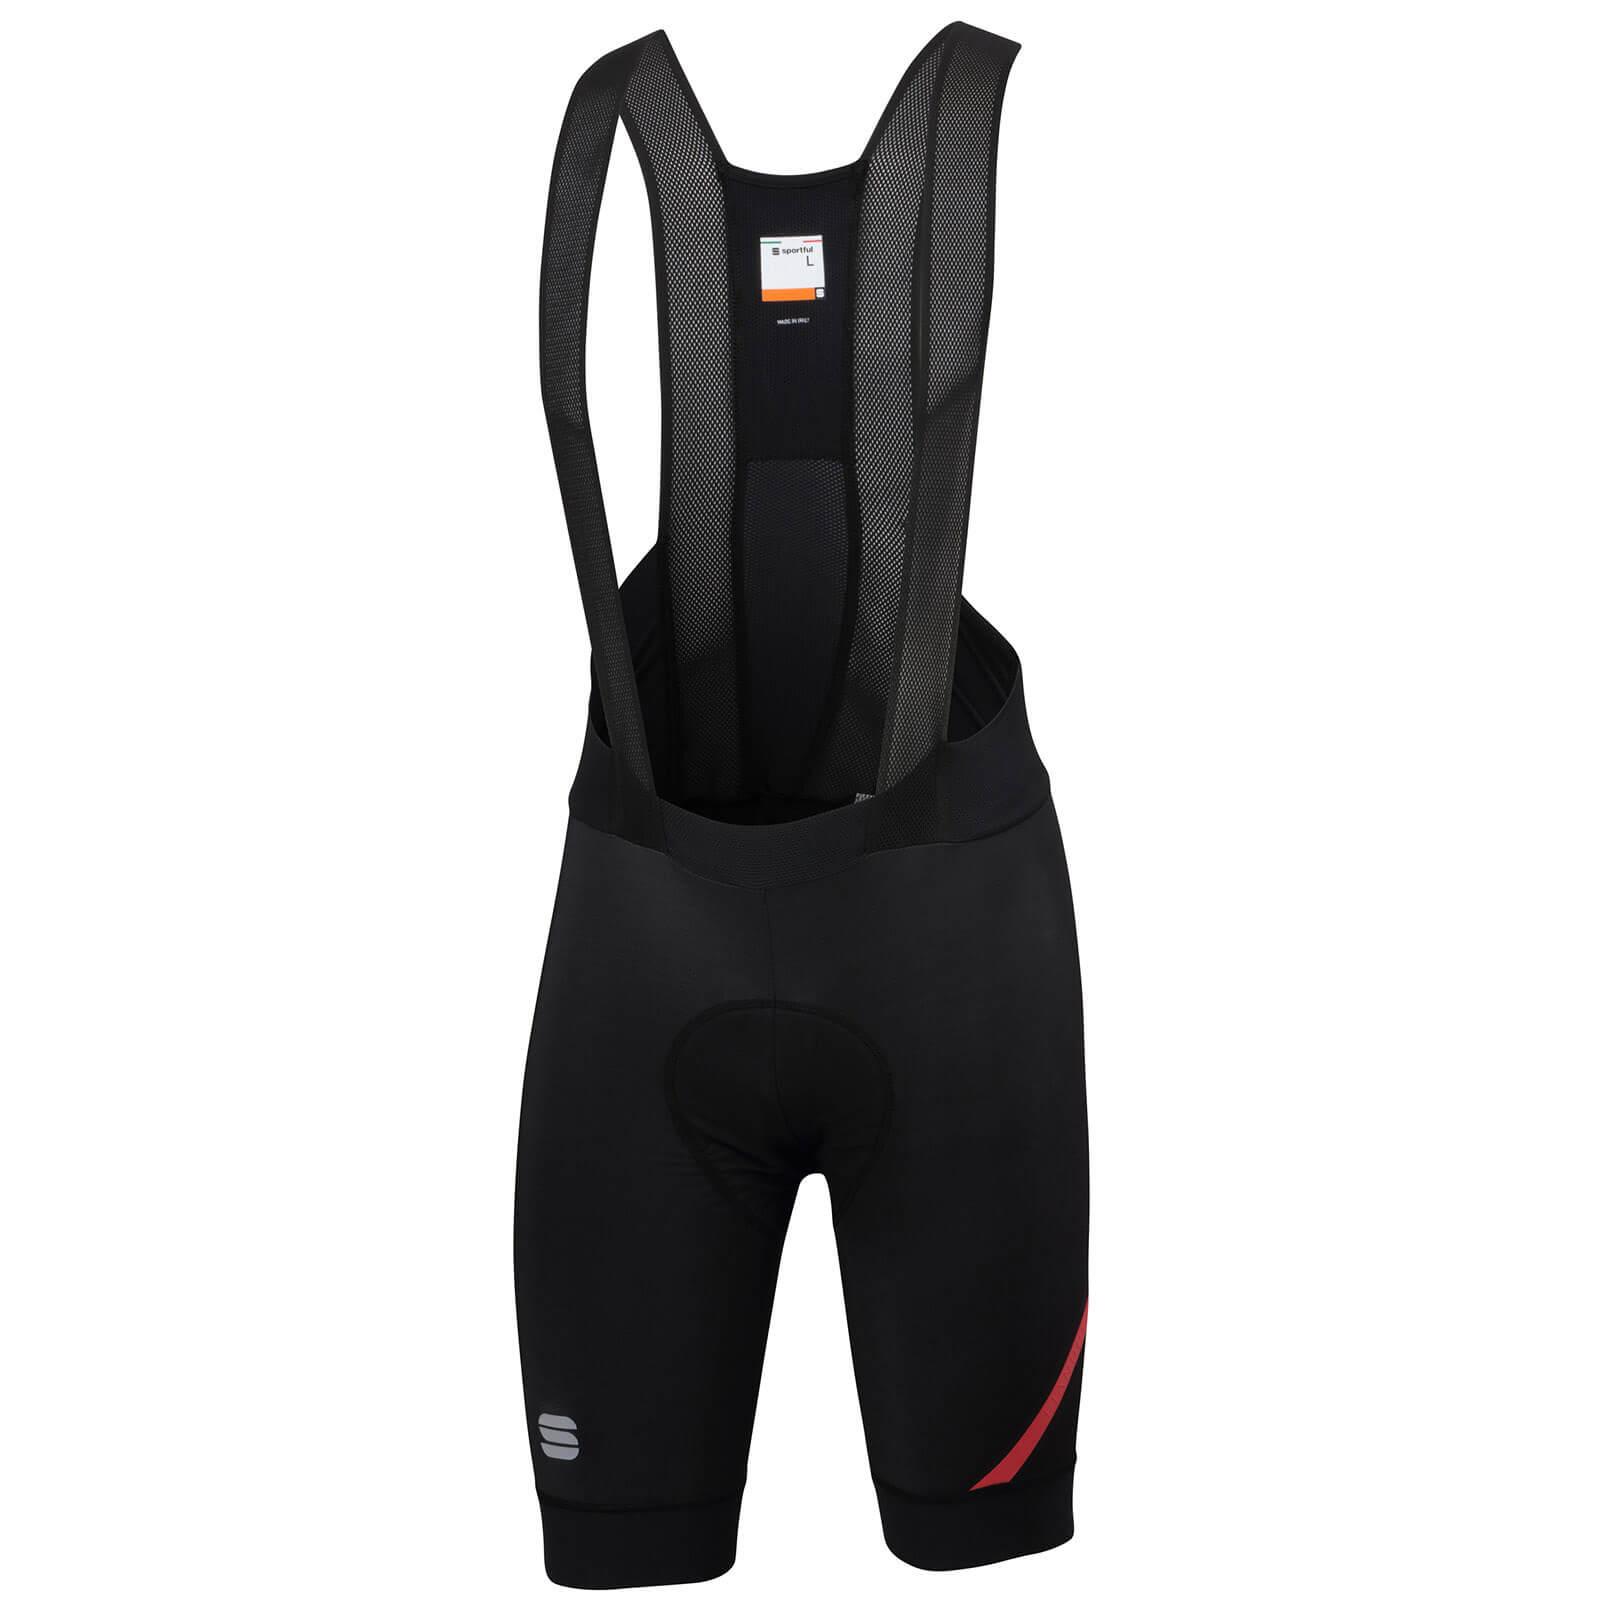 Sportful Fiandre Norain Pro Bib Shorts - S - Black